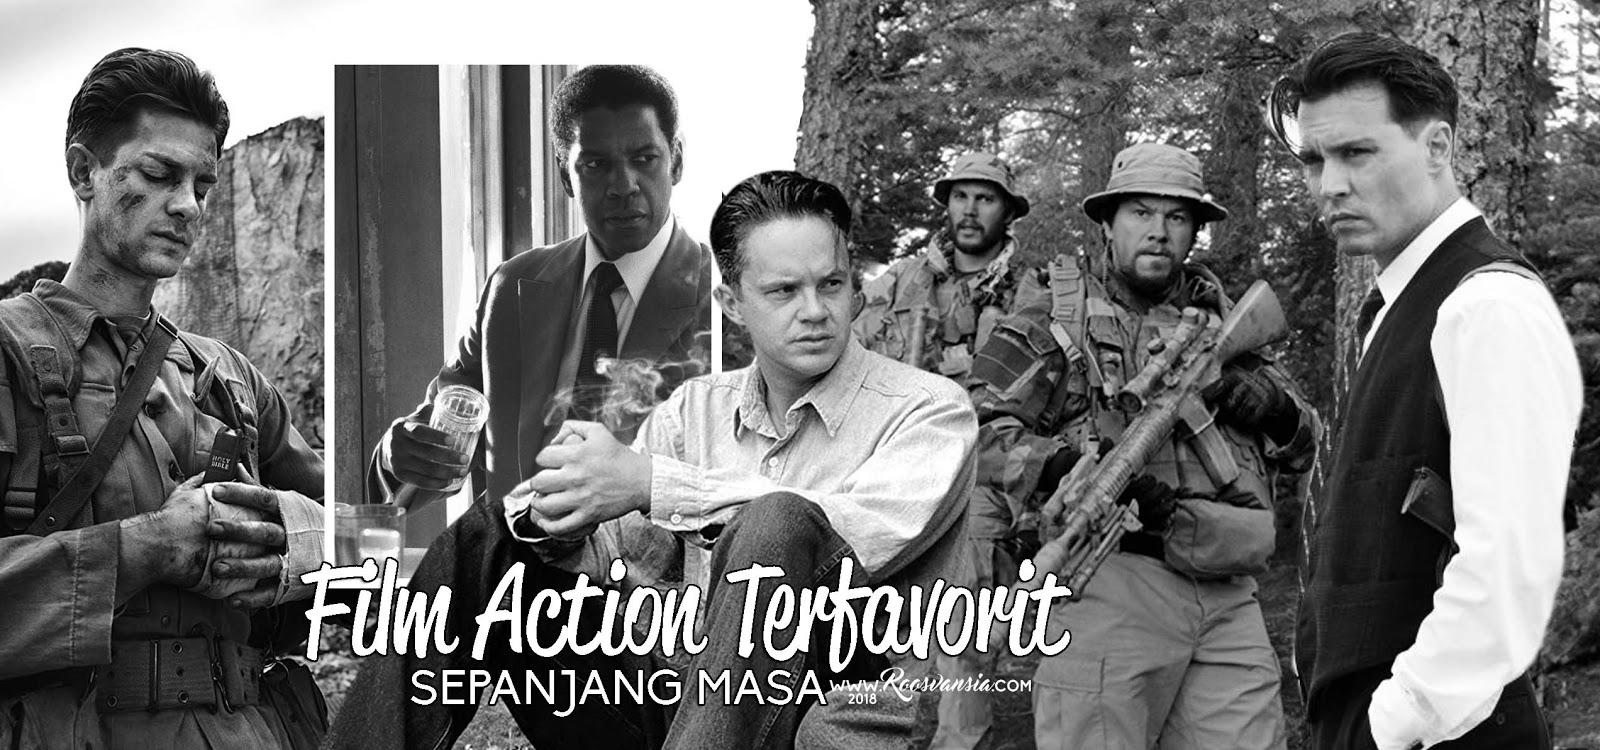 5 Film Action Terfavorit Sepanjang Masa Roosvansia